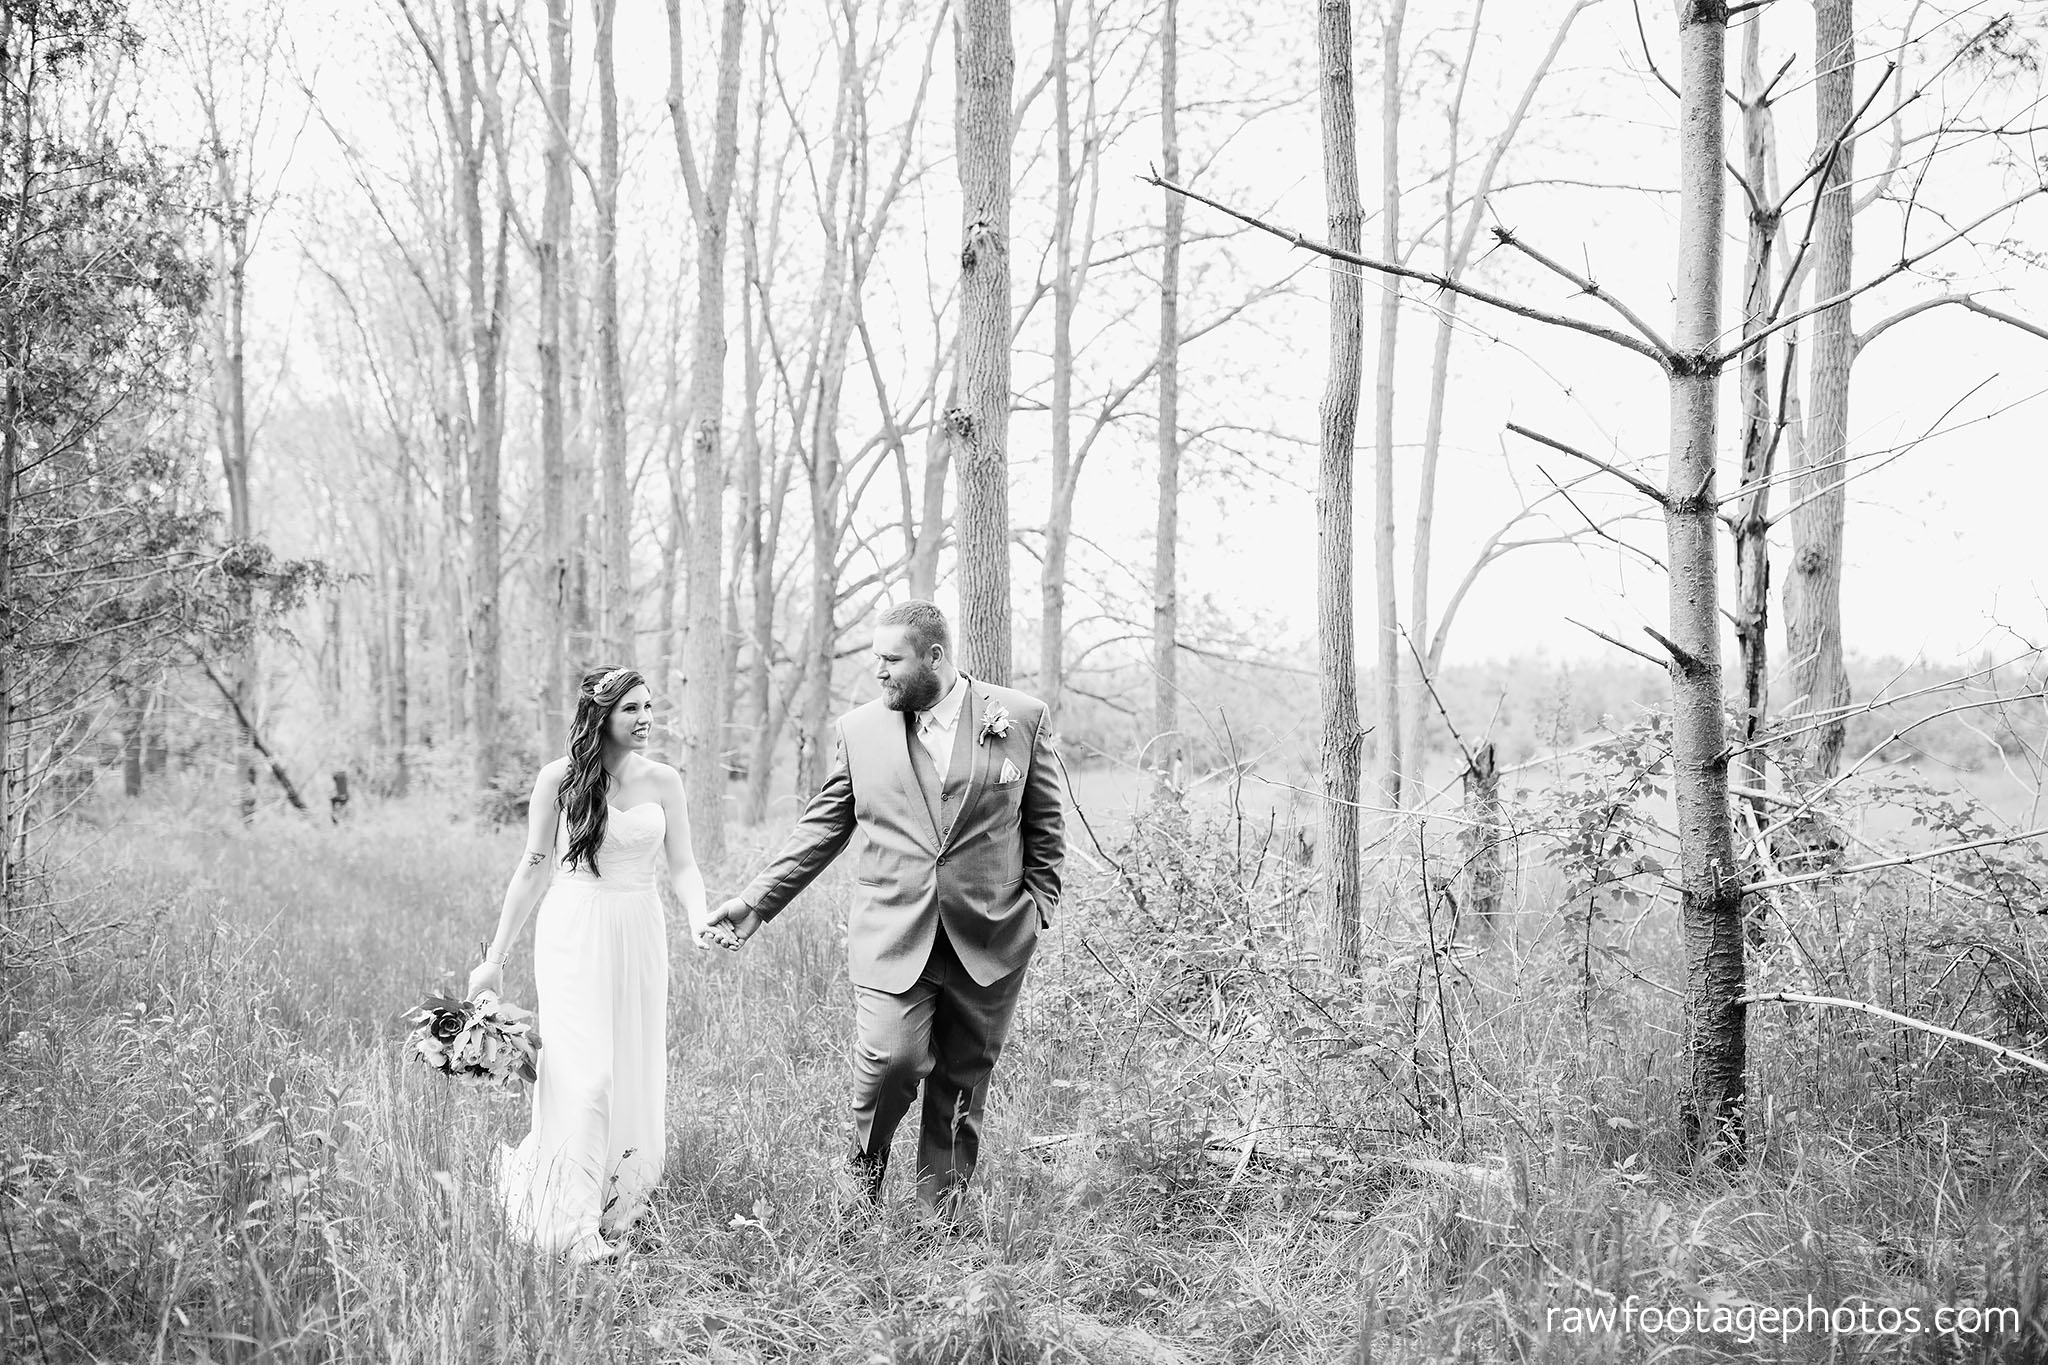 london_ontario_wedding_photographer-century_wedding_barn-raw_footage_photography-diy_wedding040.jpg